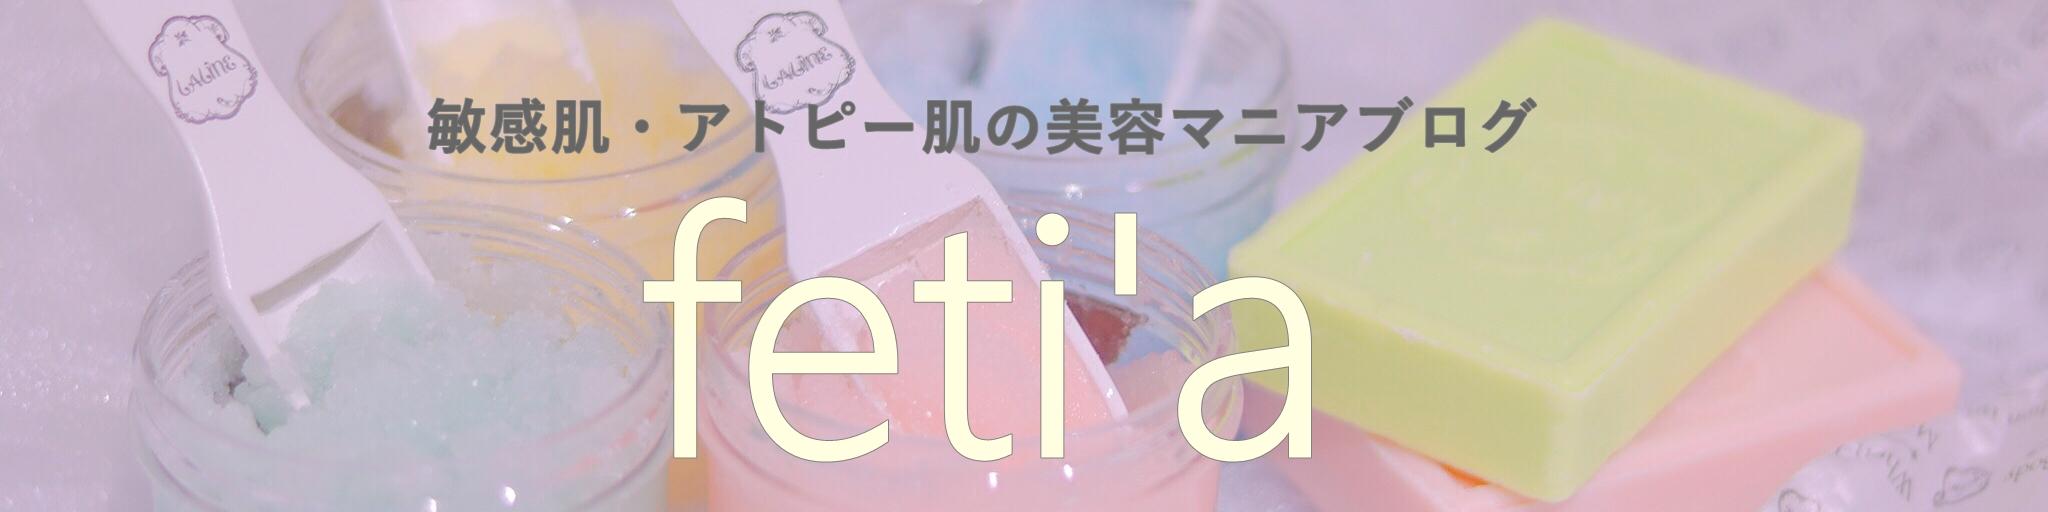 feti'a-敏感肌のアラサーが試したオススメスキンケアレビューブログ-